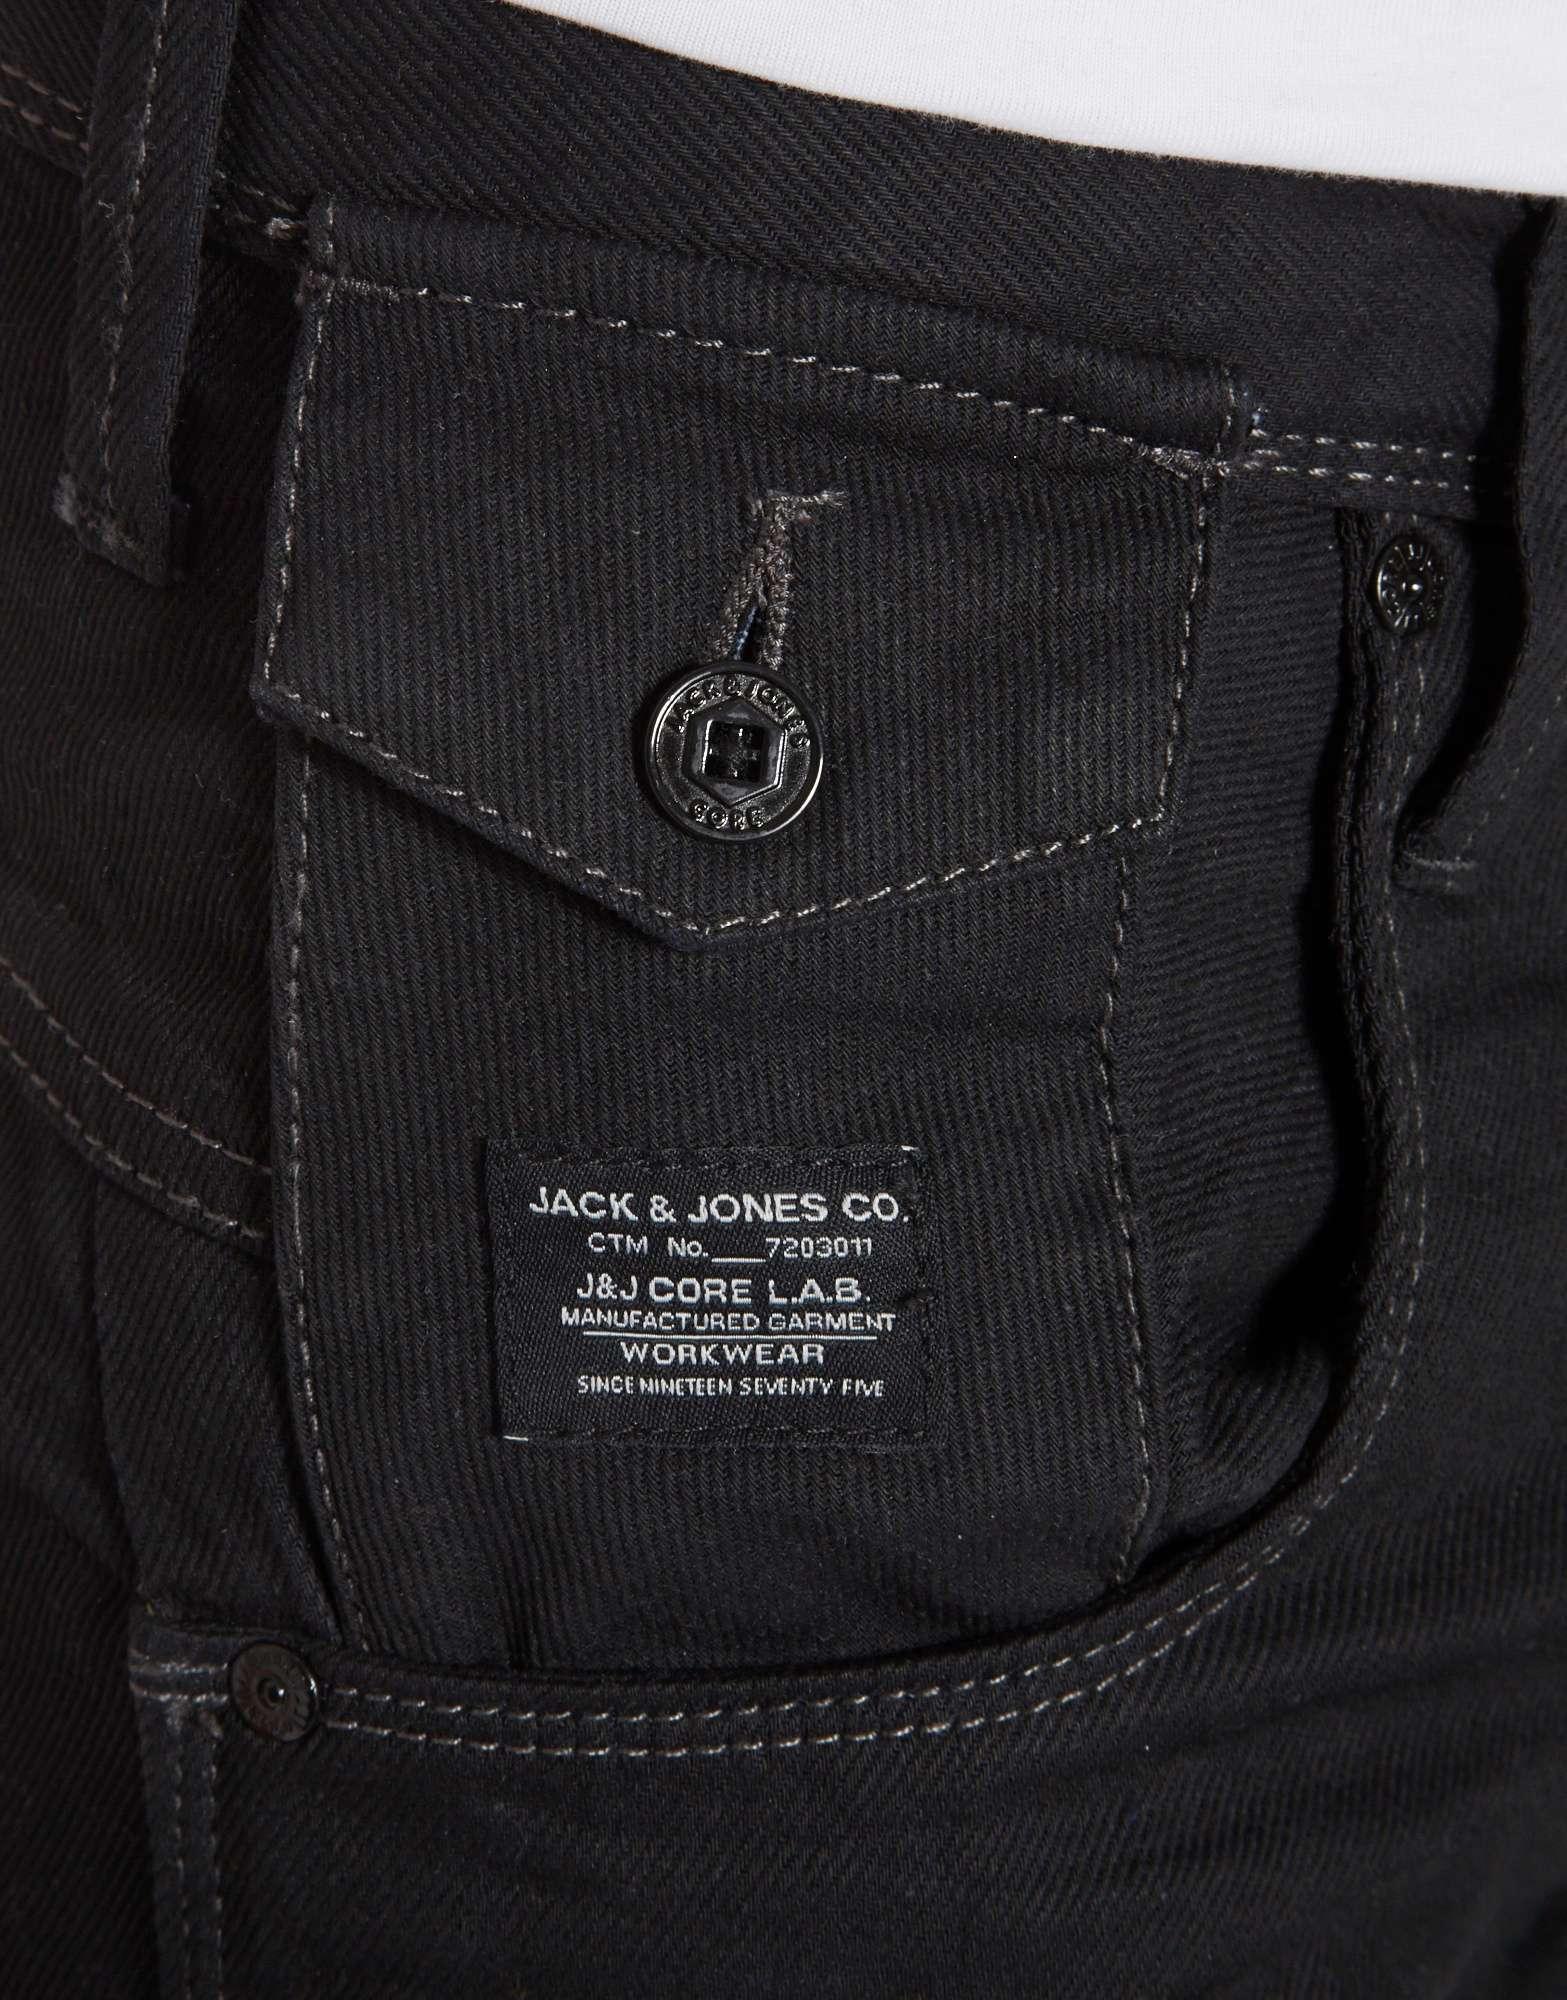 Jack & Jones Core Stan Osaka Anti Fit Jeans